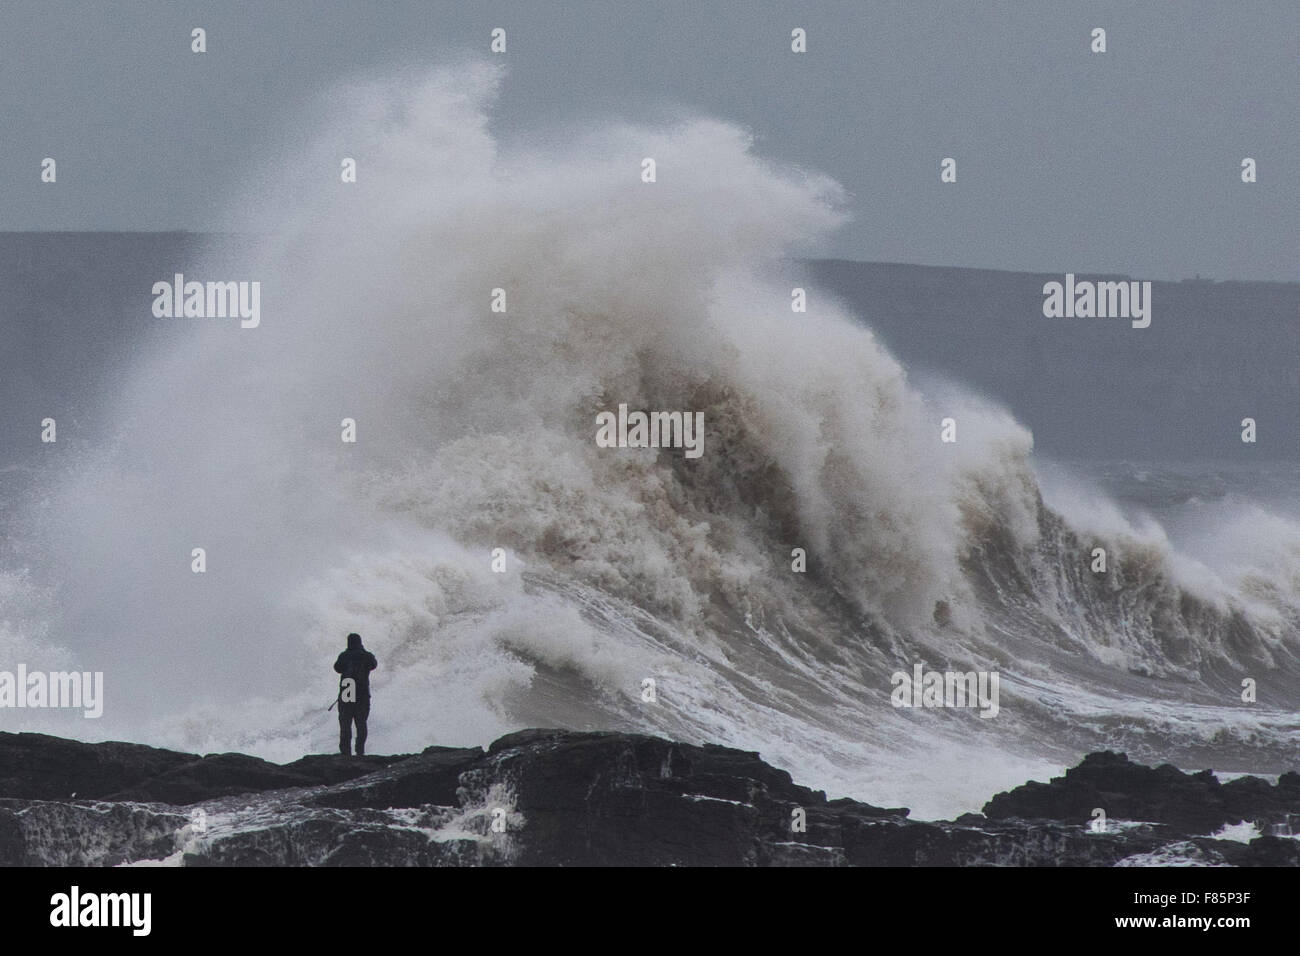 Porthcawl, Wales, UK. 5. Dezember 2015. Ein Fotograf steht gefährlich nahe am Meer in Porthcawl, als riesige Stockbild